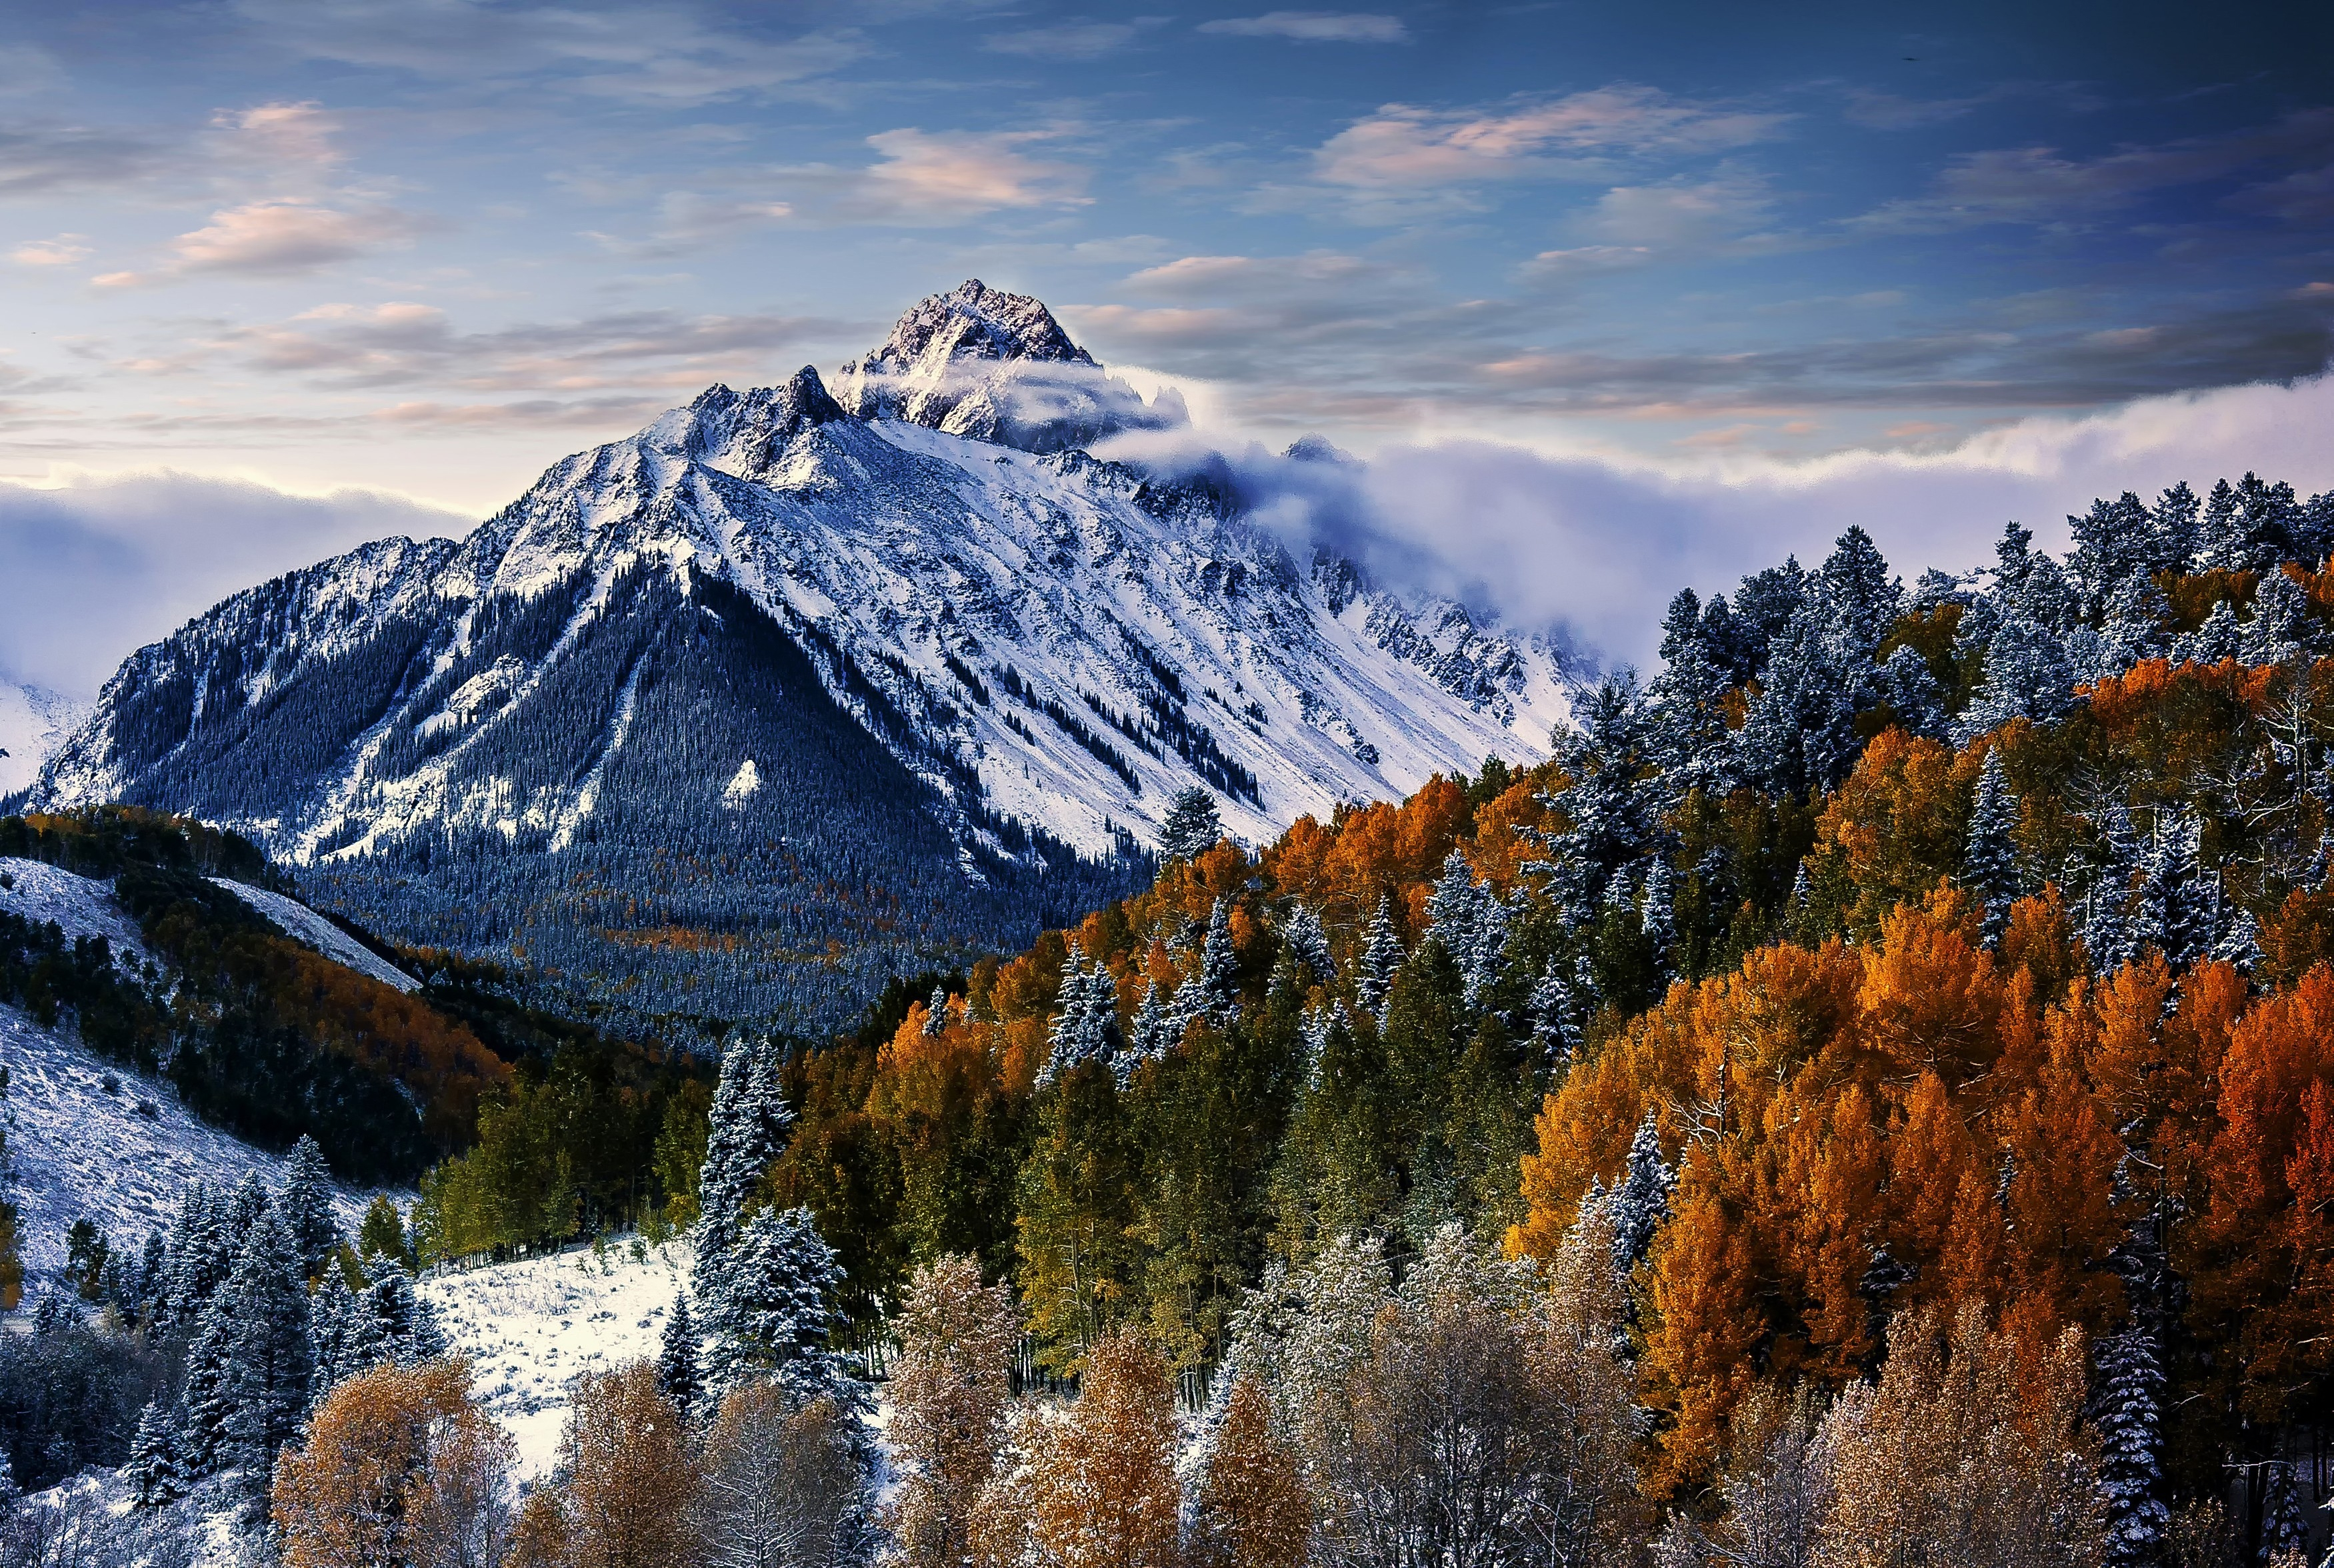 Iphone 4s Galaxy Wallpaper Snow Mountain View Hd Wallpaper